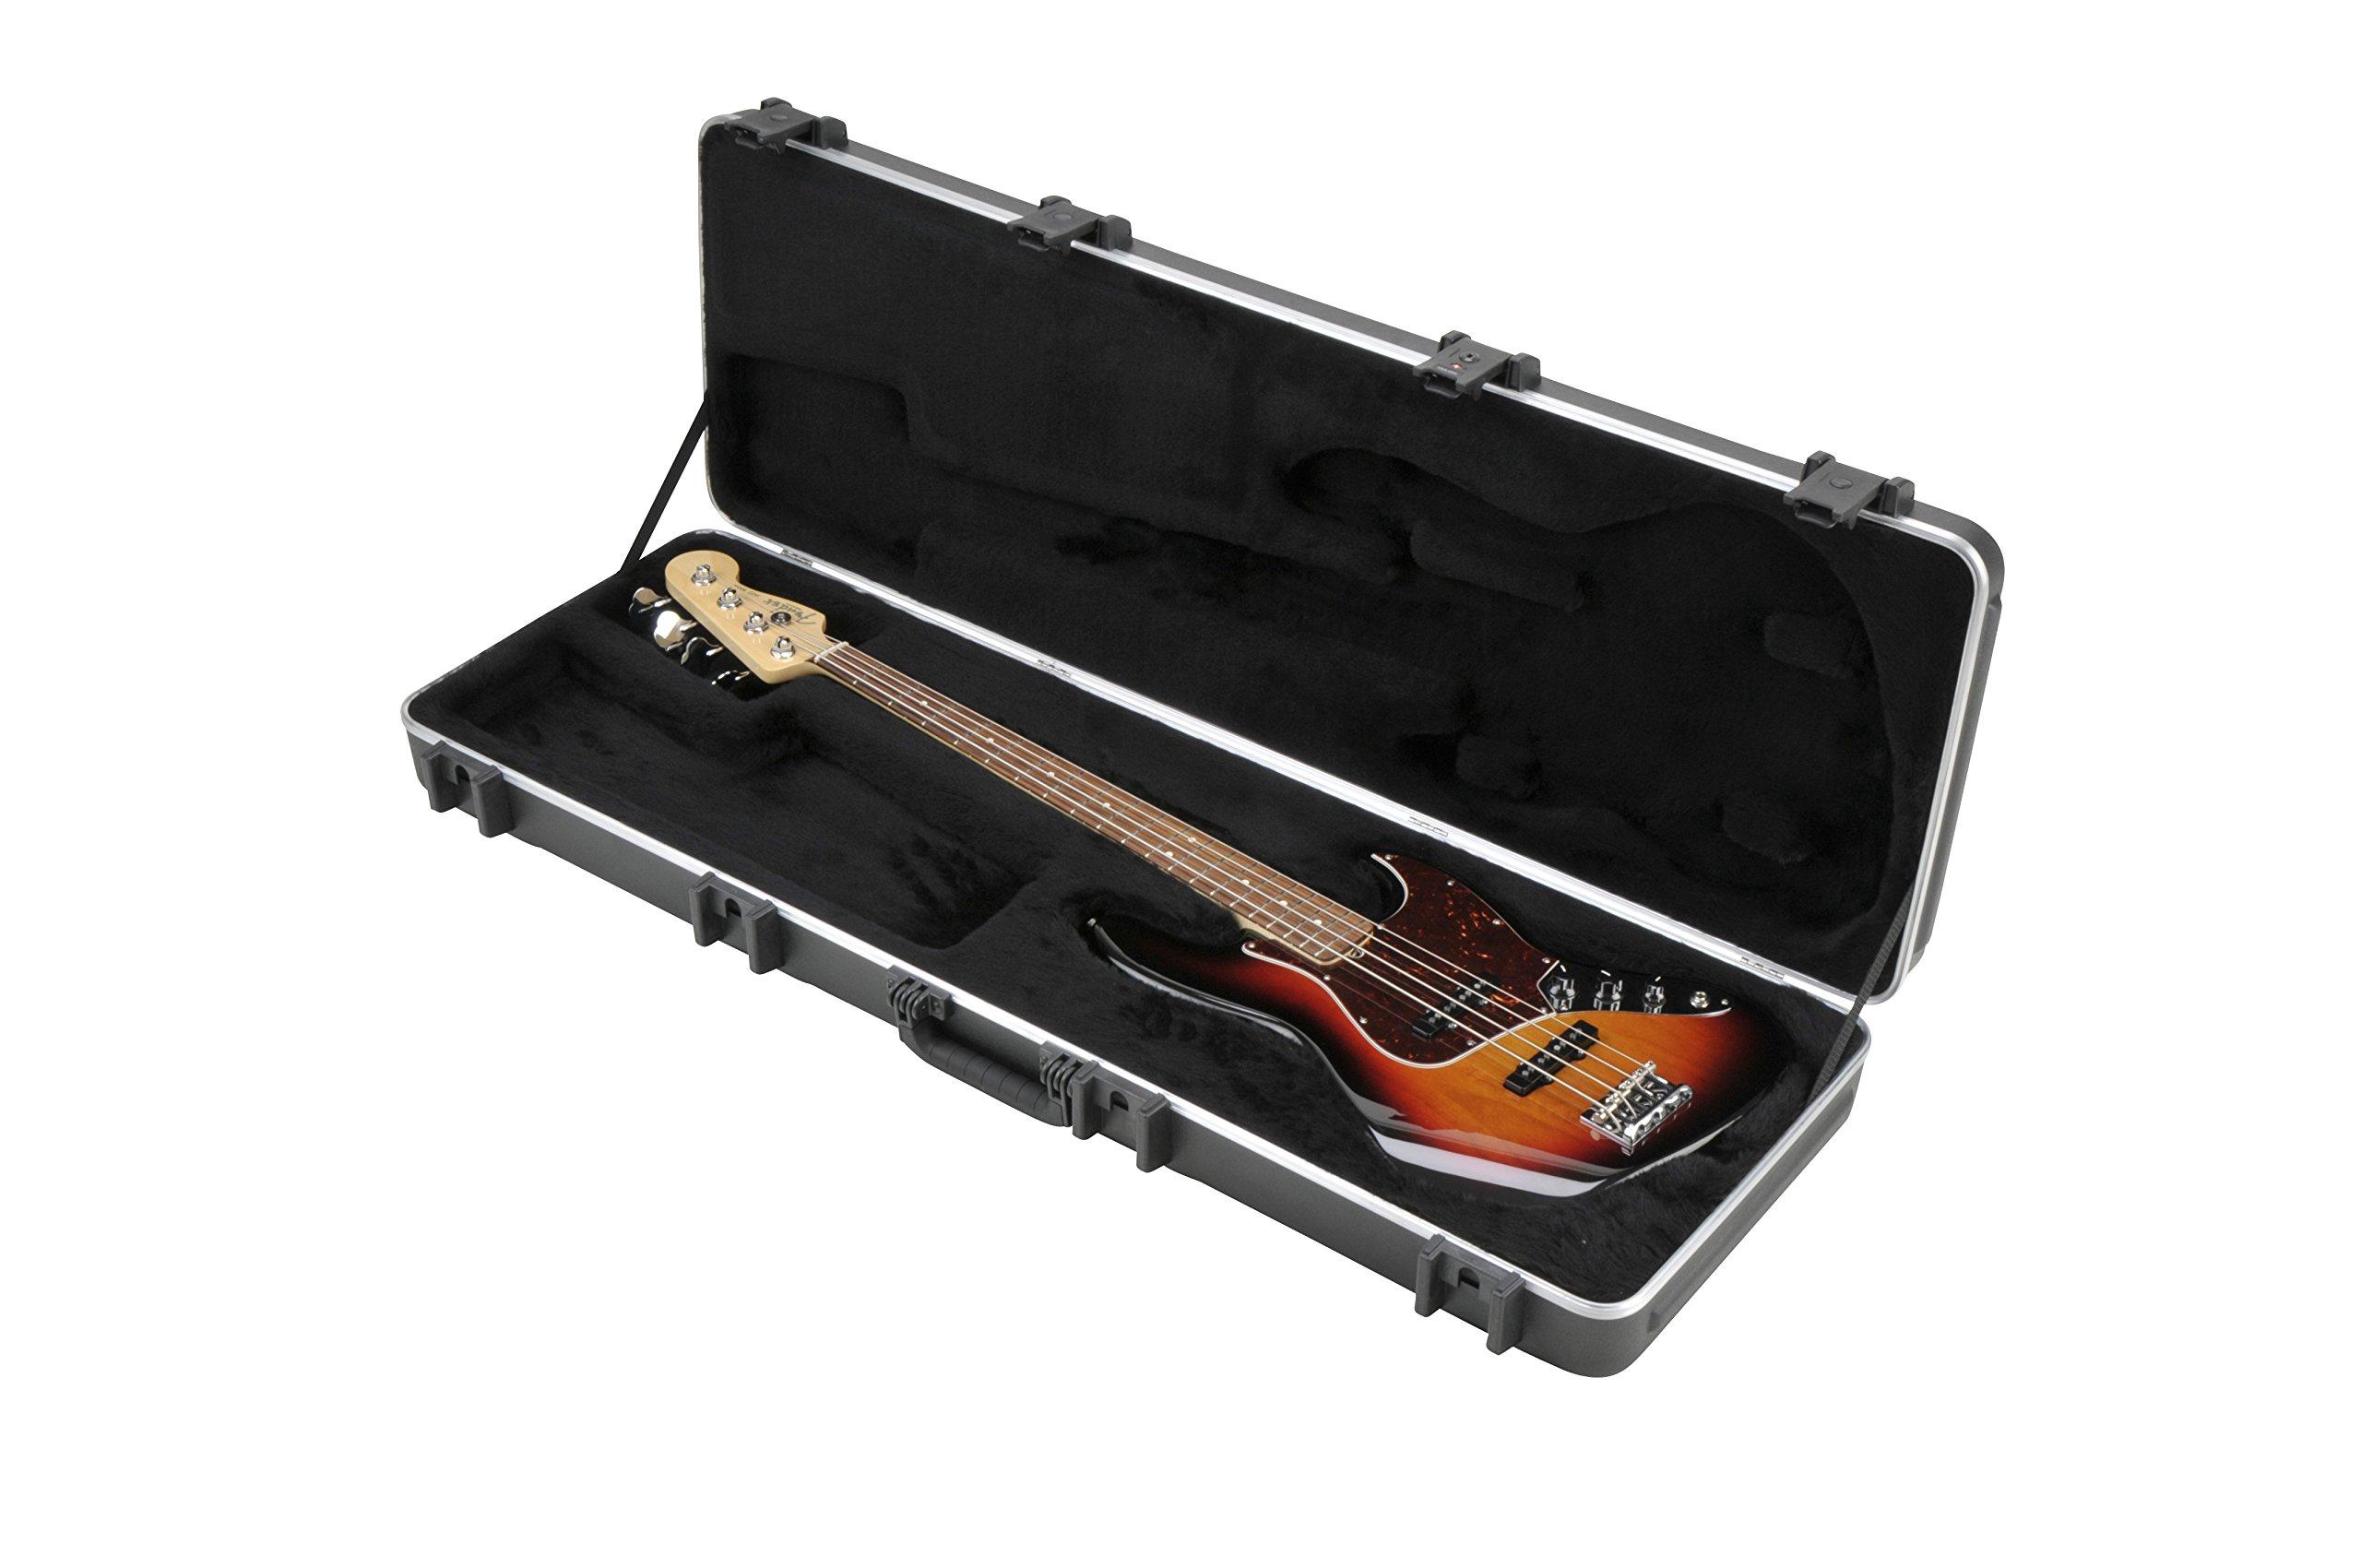 Cheap SKB 44 Pro Rectangular Hardshell Jazz/Precision Style Electric Bass Guitar Case (1SKB-44PRO) Black Friday & Cyber Monday 2019